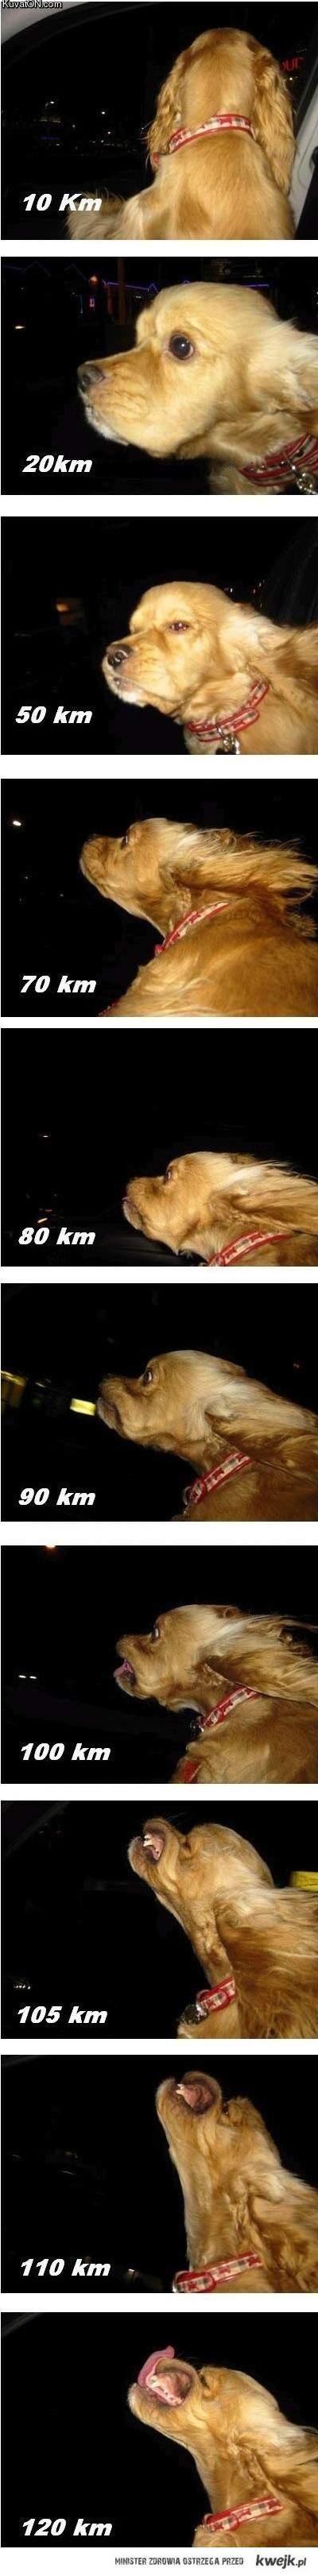 pies jako licznik